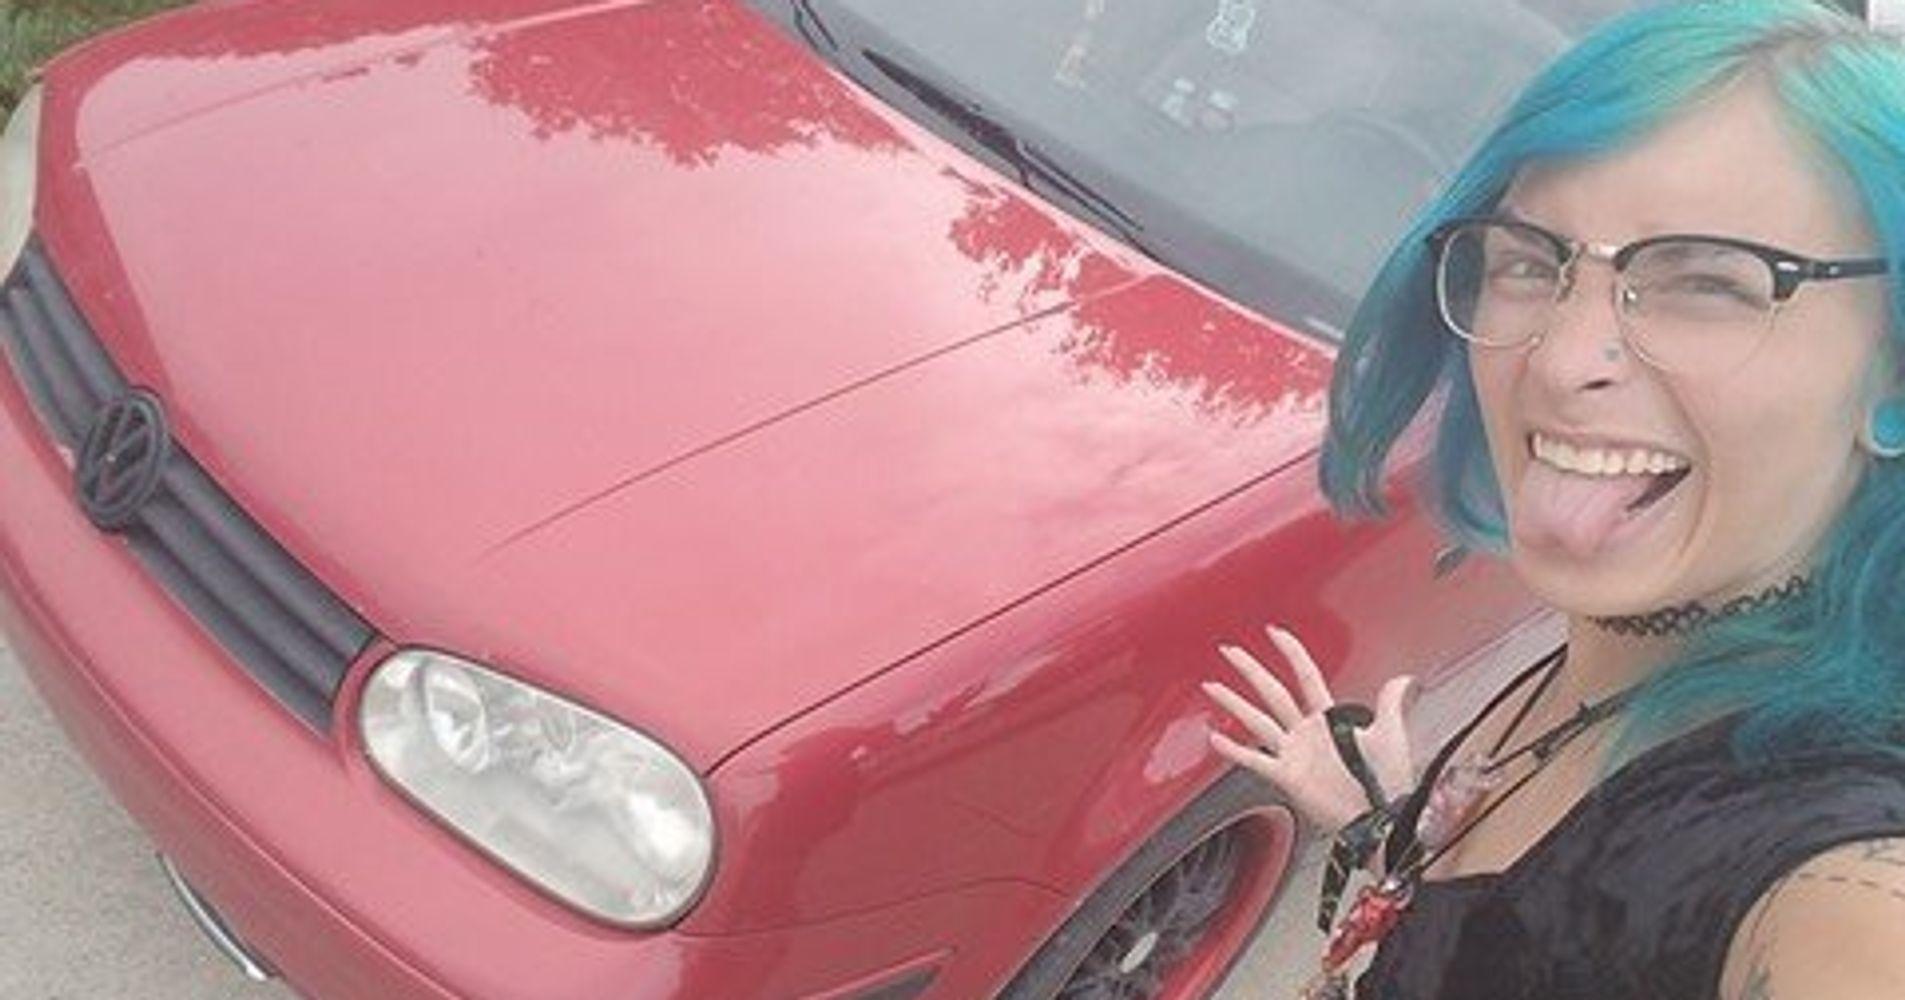 Woman Trades Packet Of McDonald\'s Szechuan Sauce For Car | HuffPost